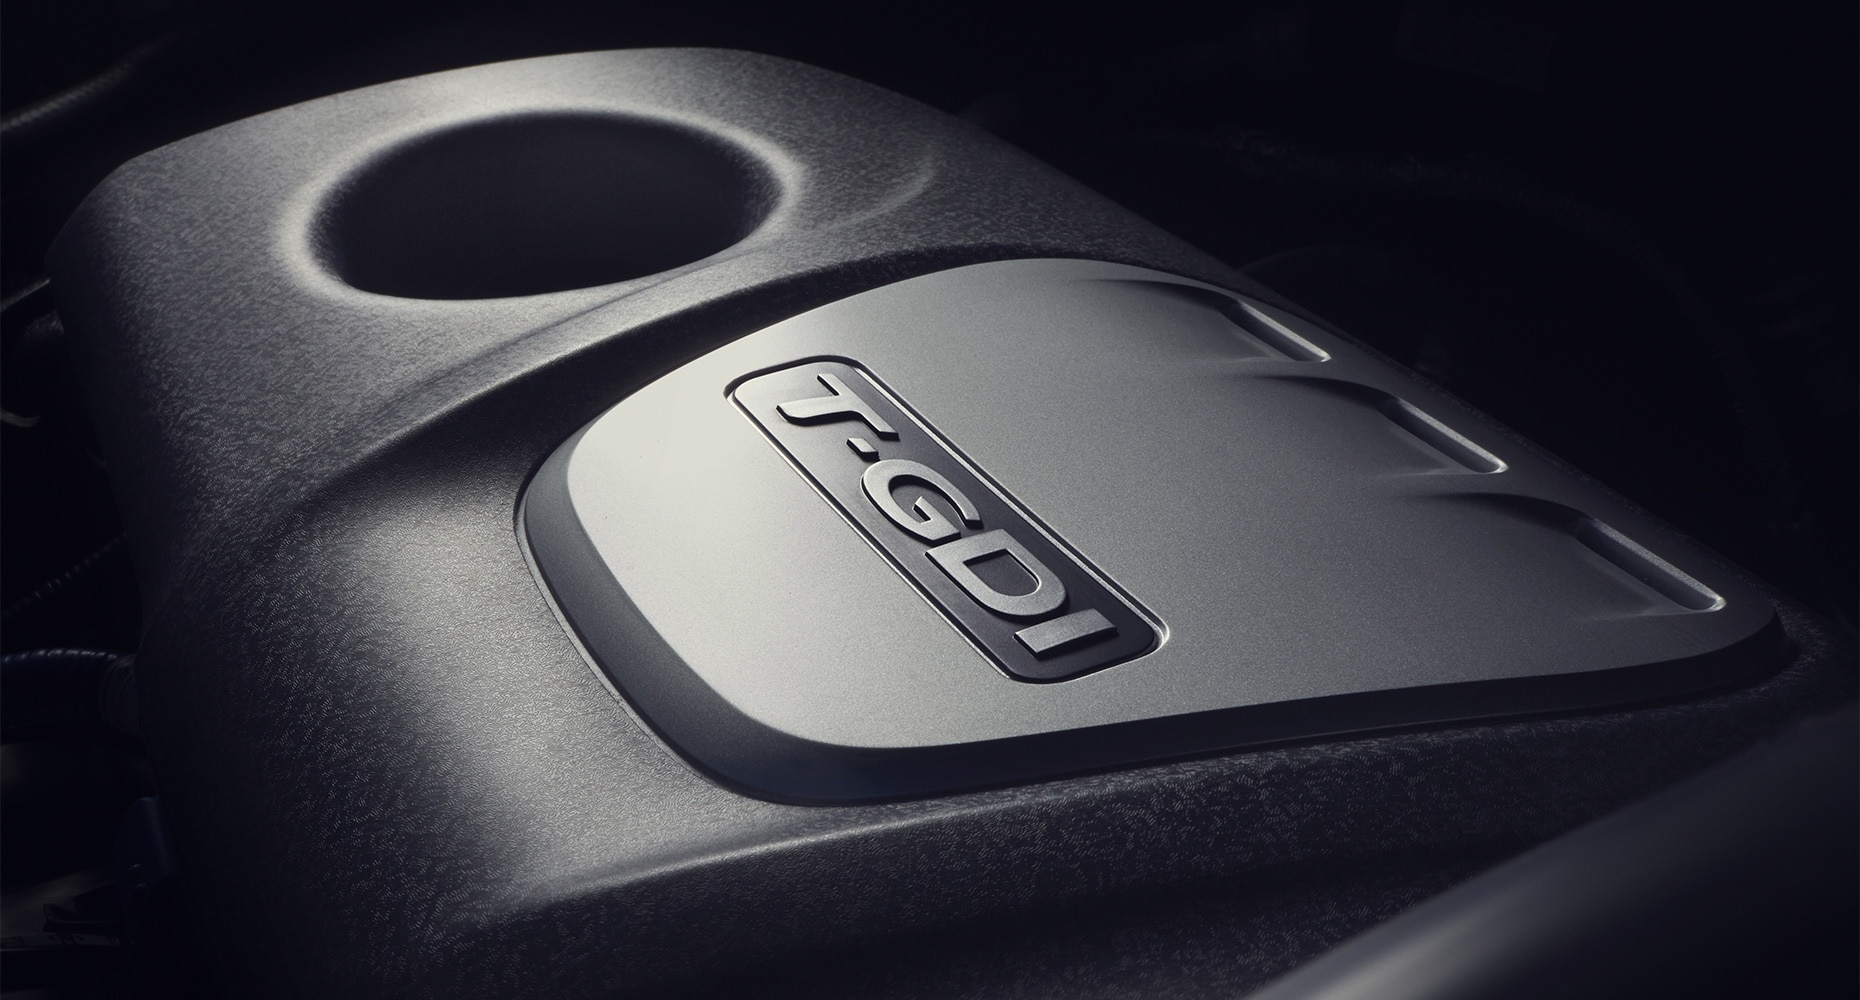 1.6L Turbo GDI engine with 7-speed Dual Clutch Transmission